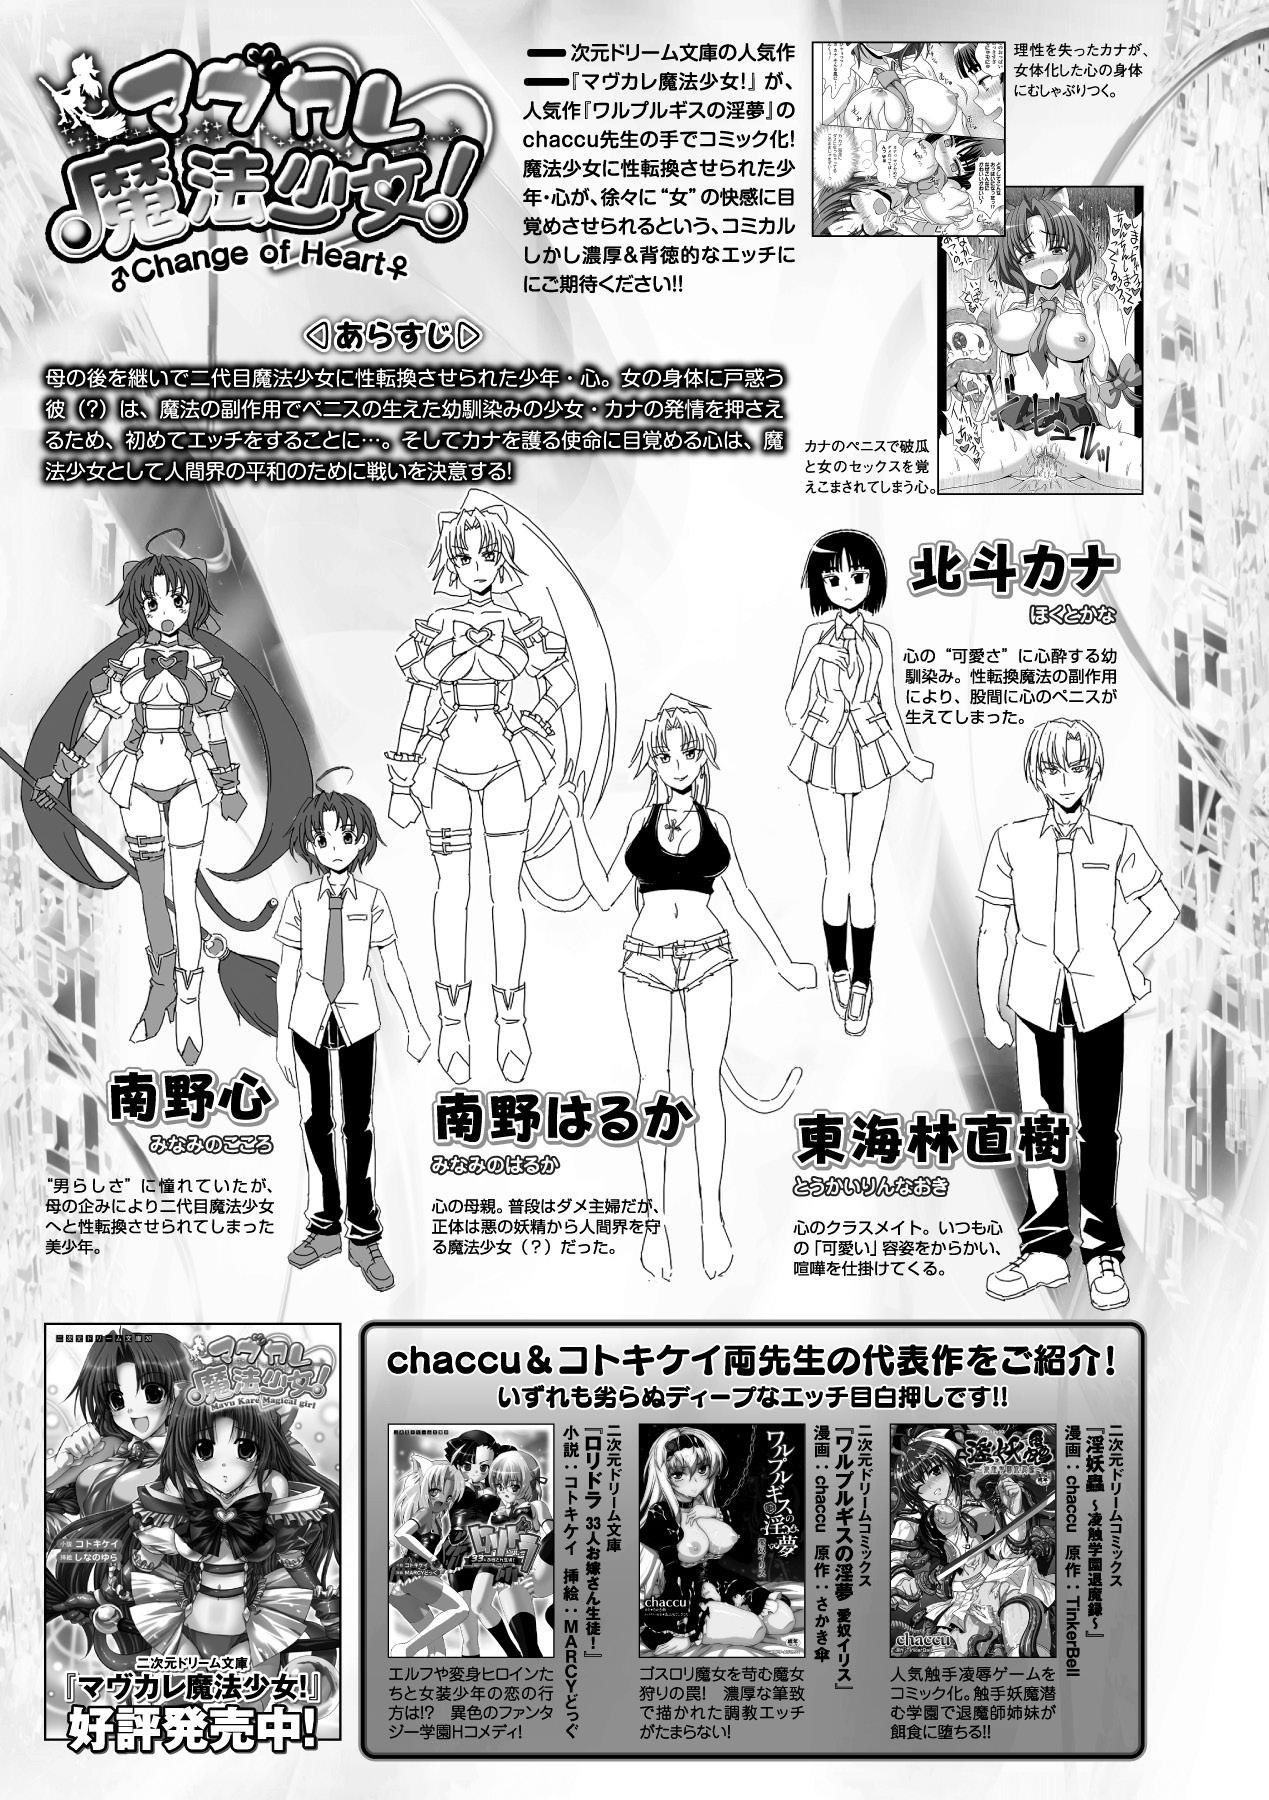 Megami Crisis 10 48